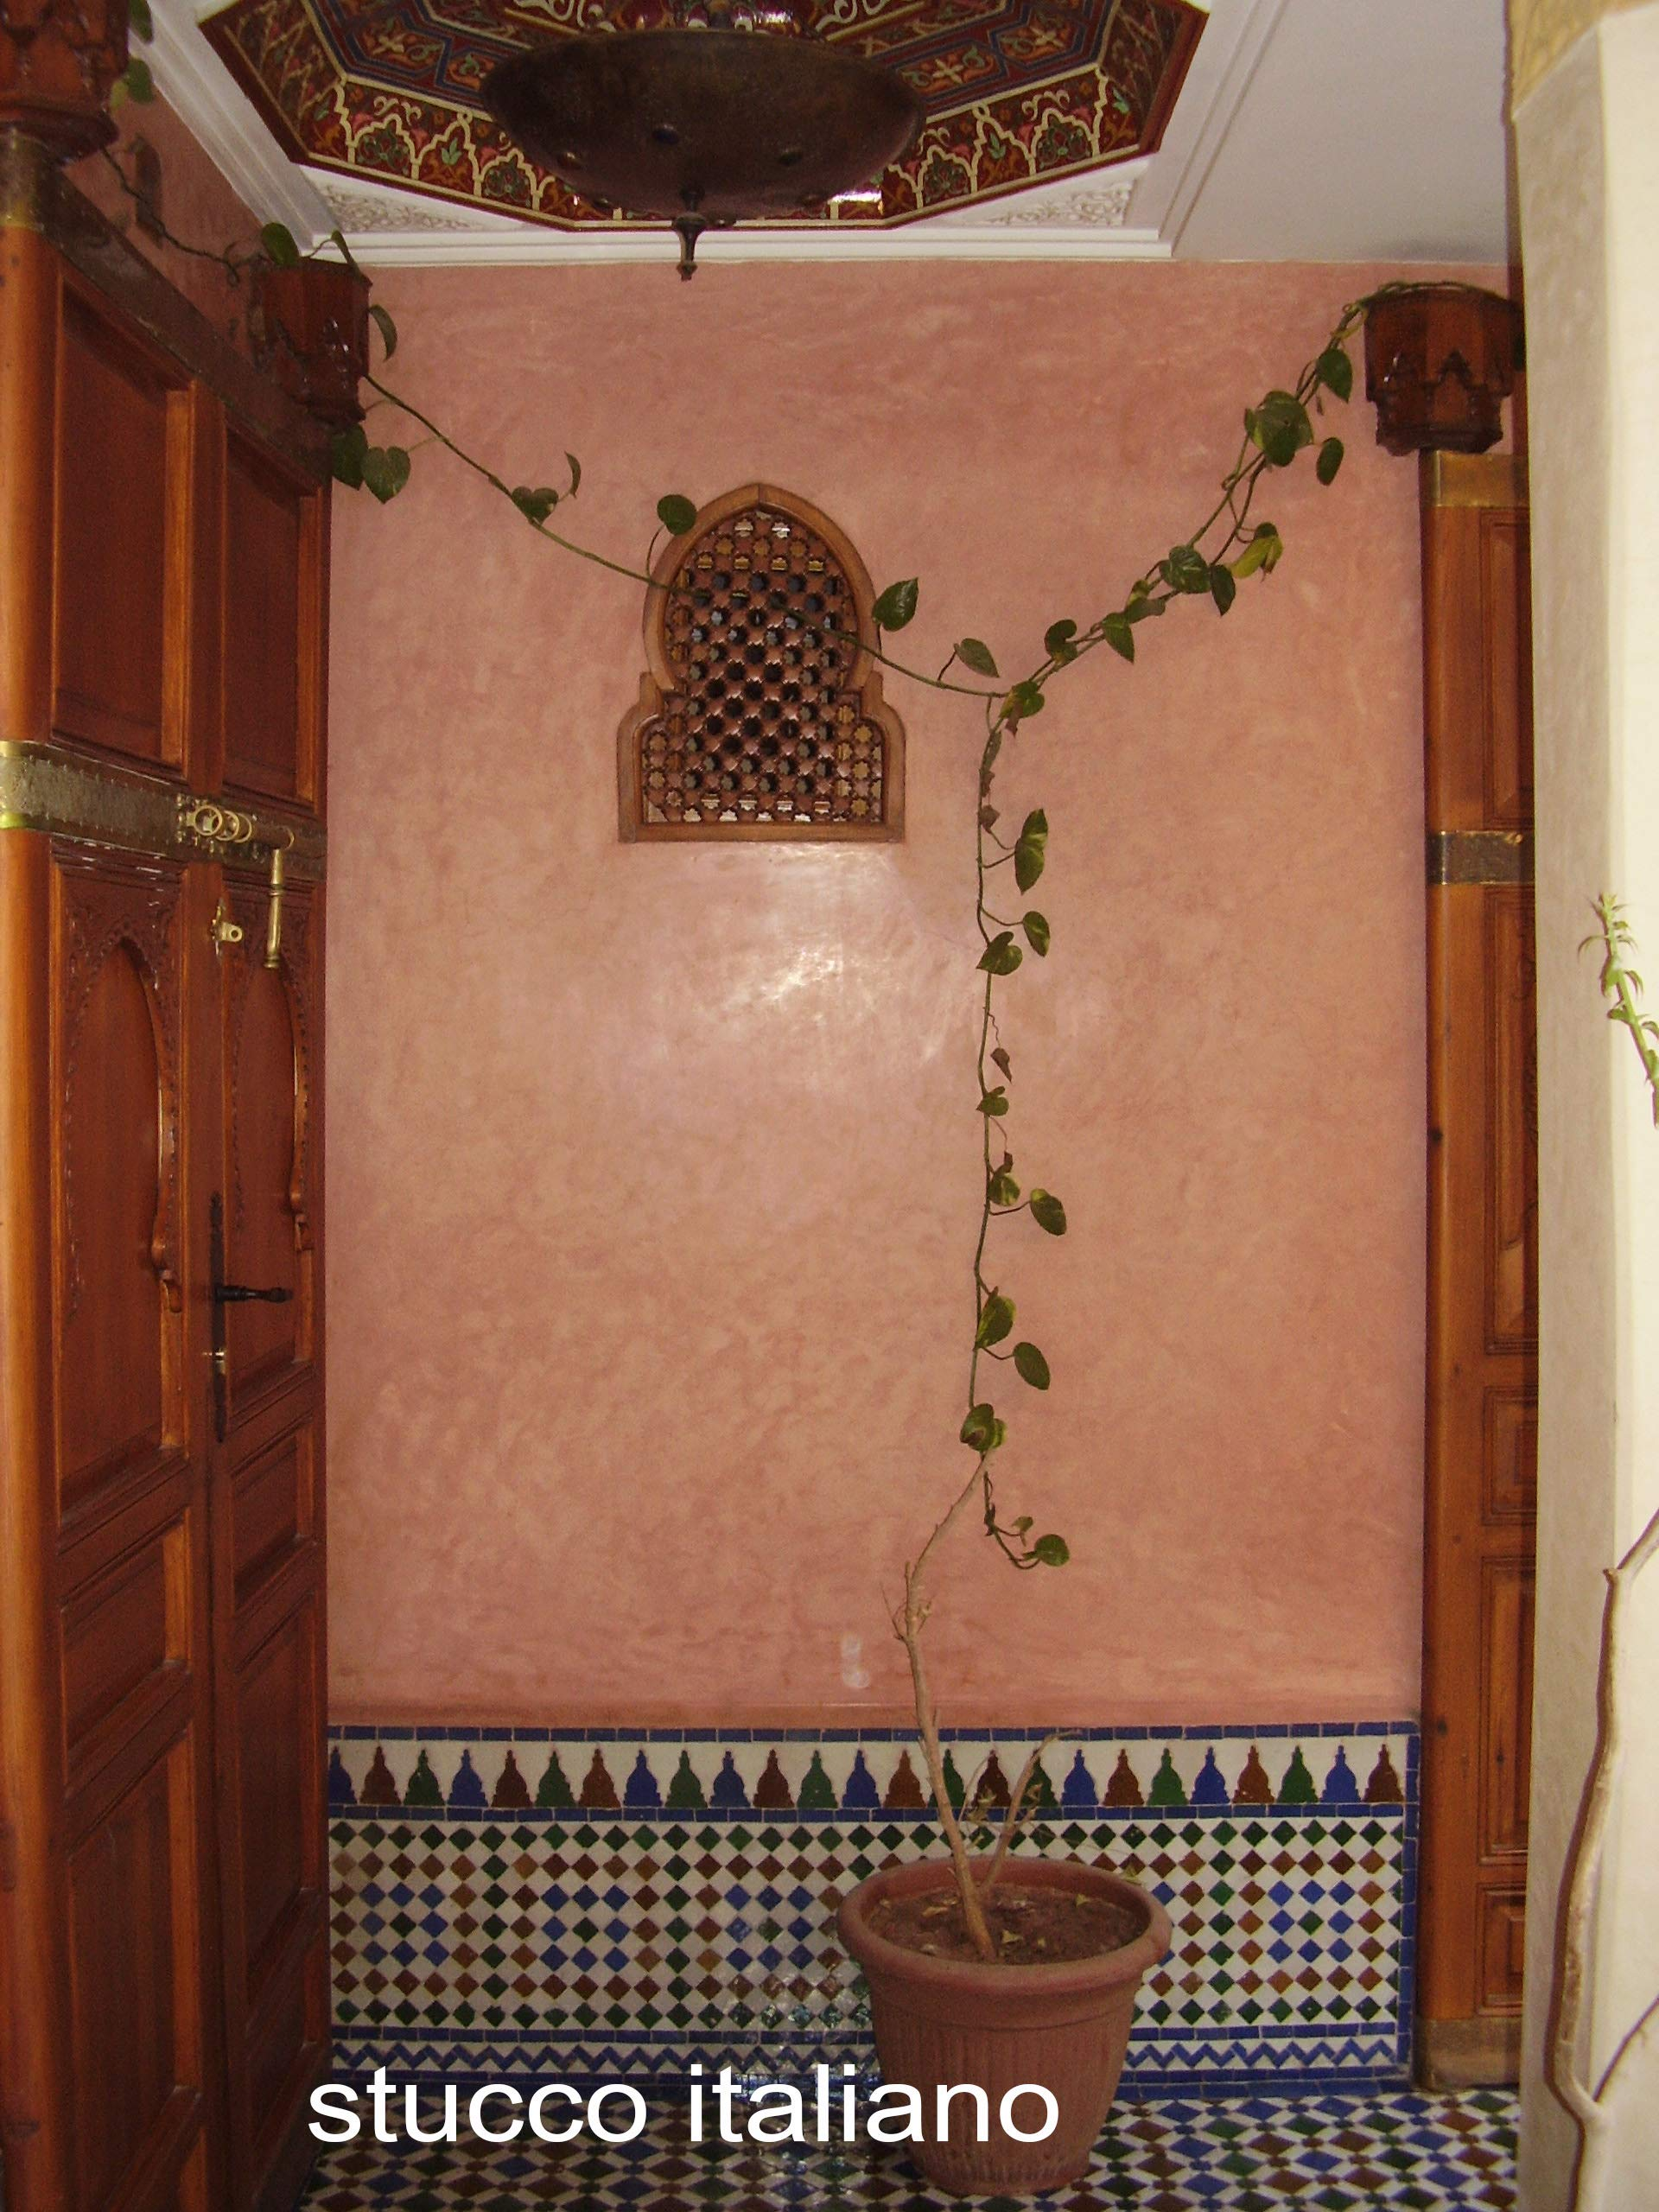 Stucco Italiano Tadelakt Moroccan Plaster 16 KG Tub